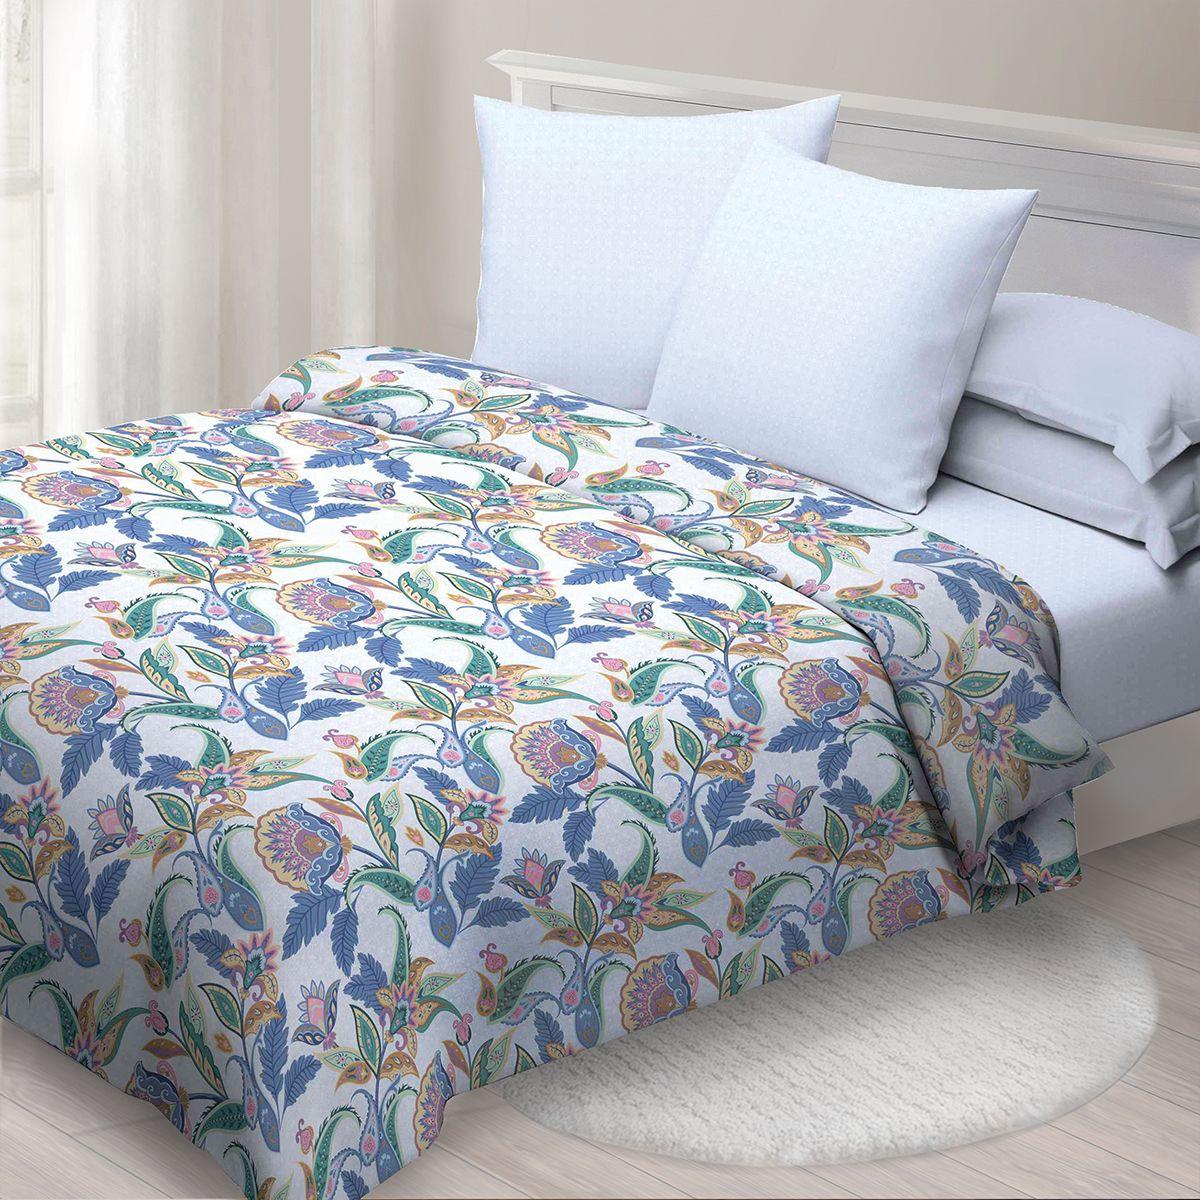 Комплект белья Спал Спалыч Индира, 1,5 спальное, наволочки 70x70, цвет: синий. 4091-185078